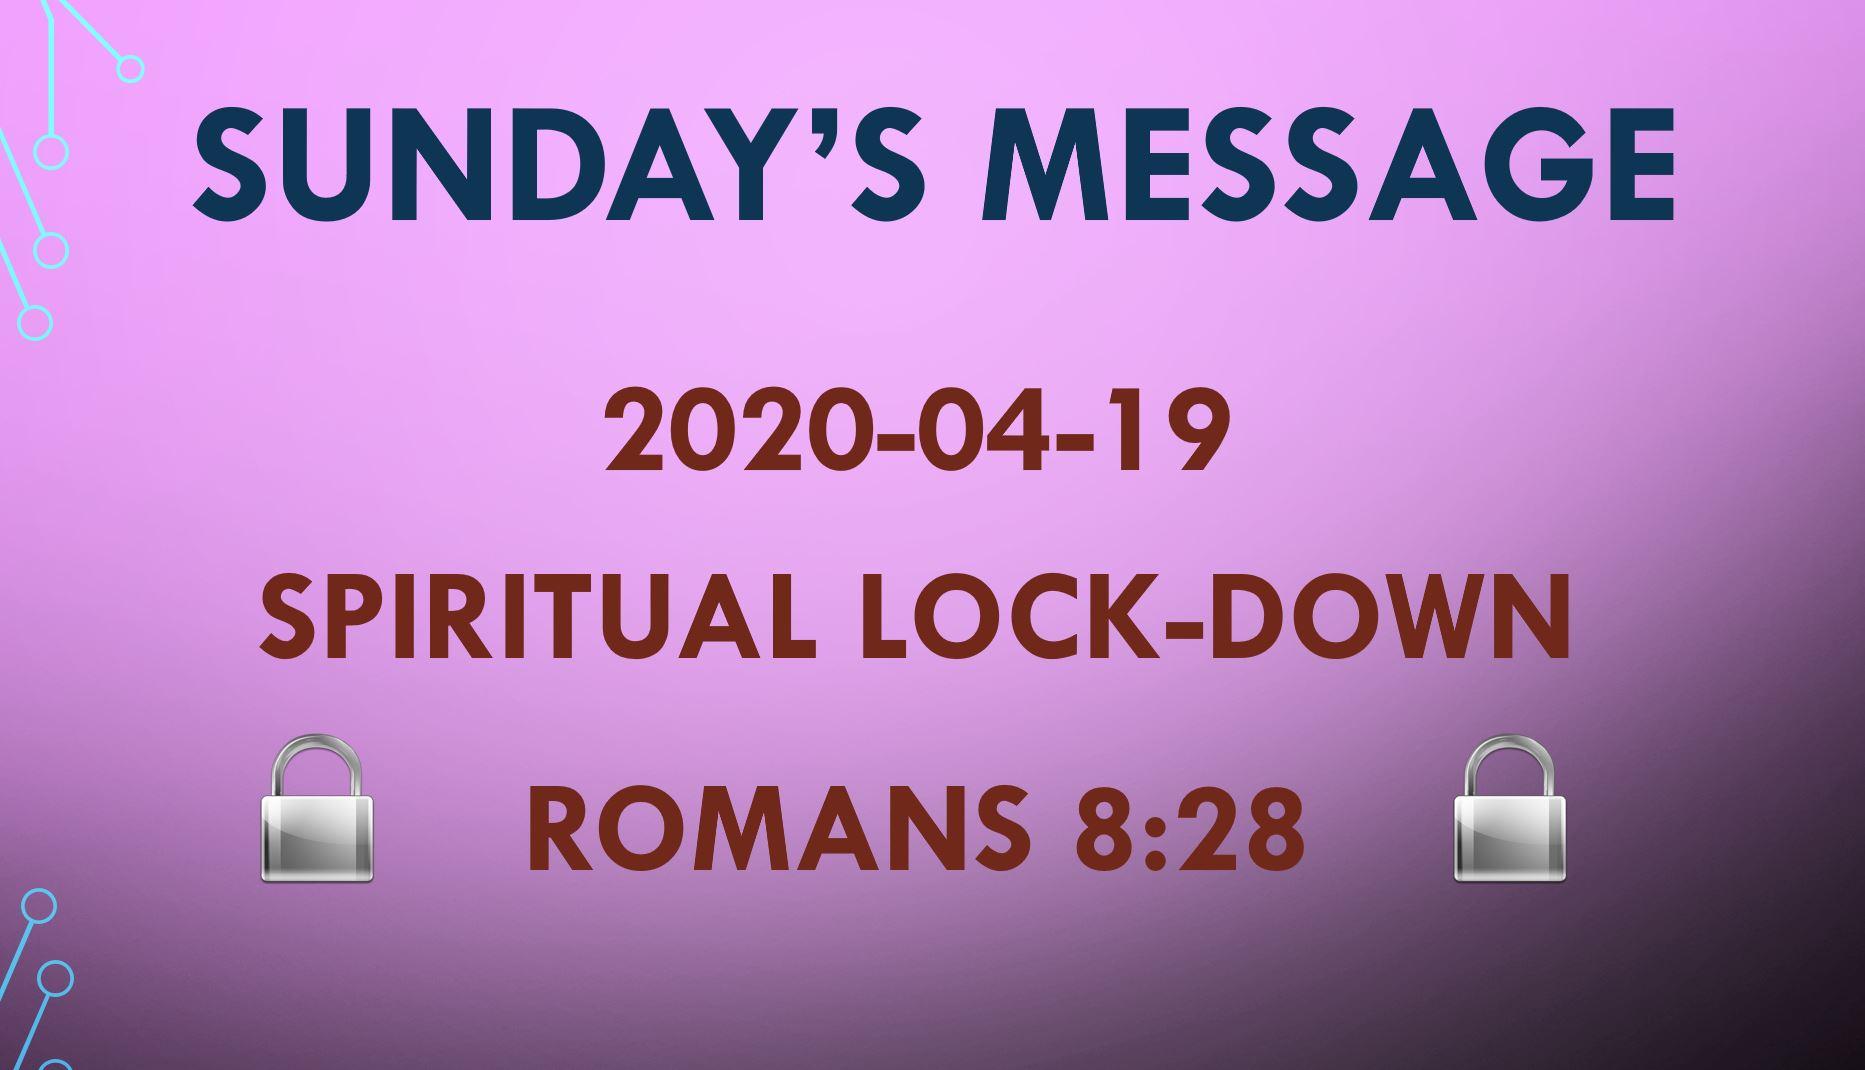 2020-04-19 Romans 8:28 – Spiritual Lock-down